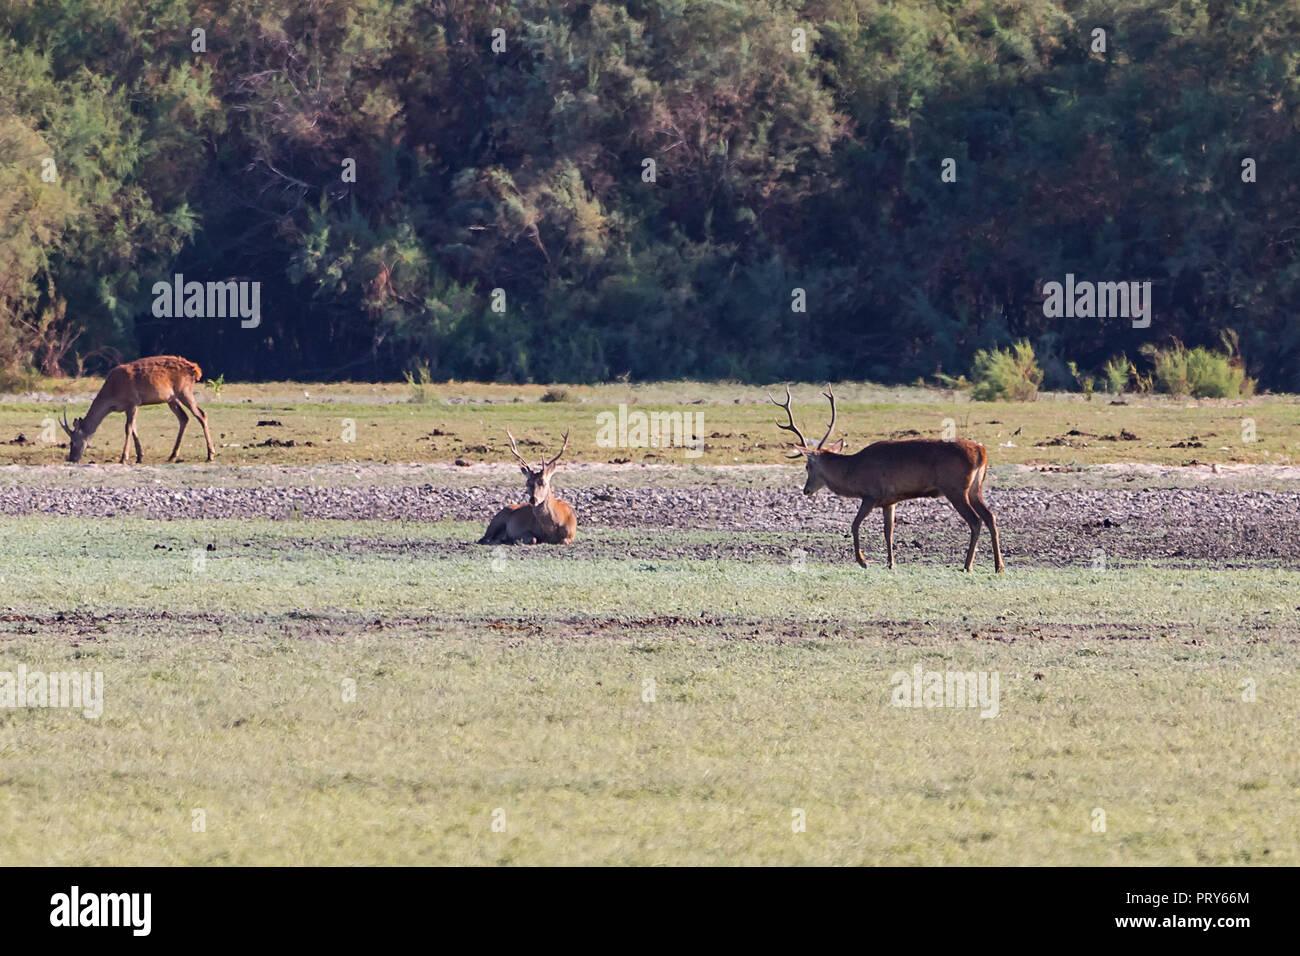 Deers during mating season in 'Doñana National Park' Donana nature reserve in El Rocio village at sunset - Stock Image